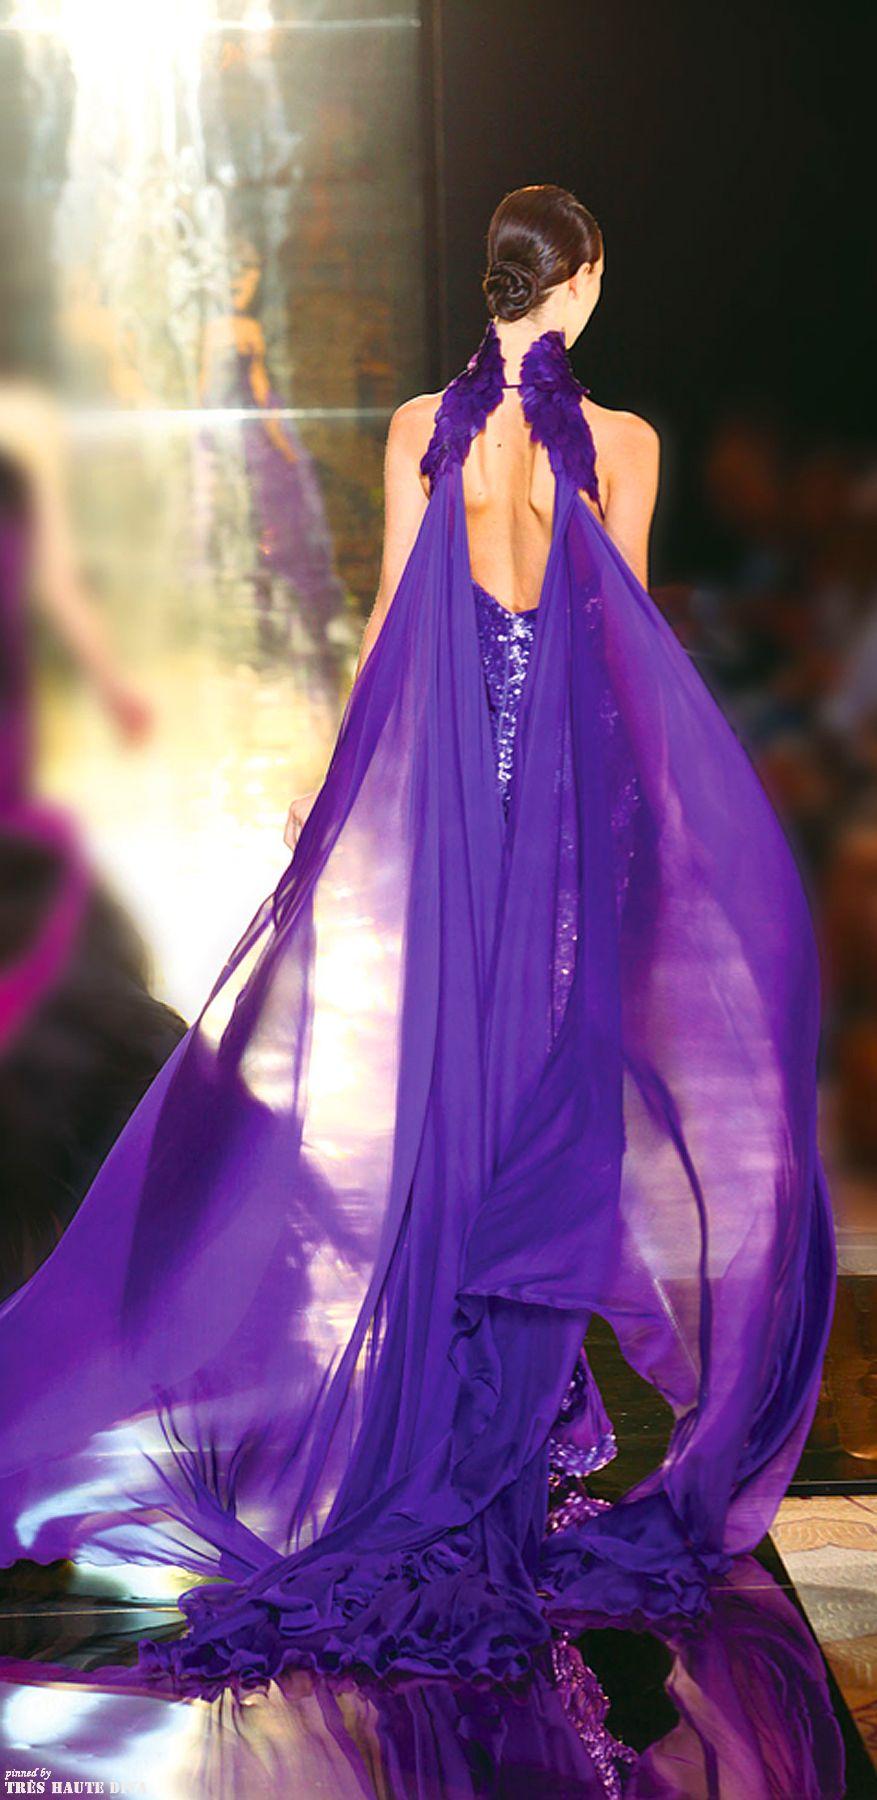 best images about purple on pinterest purple candles lavender